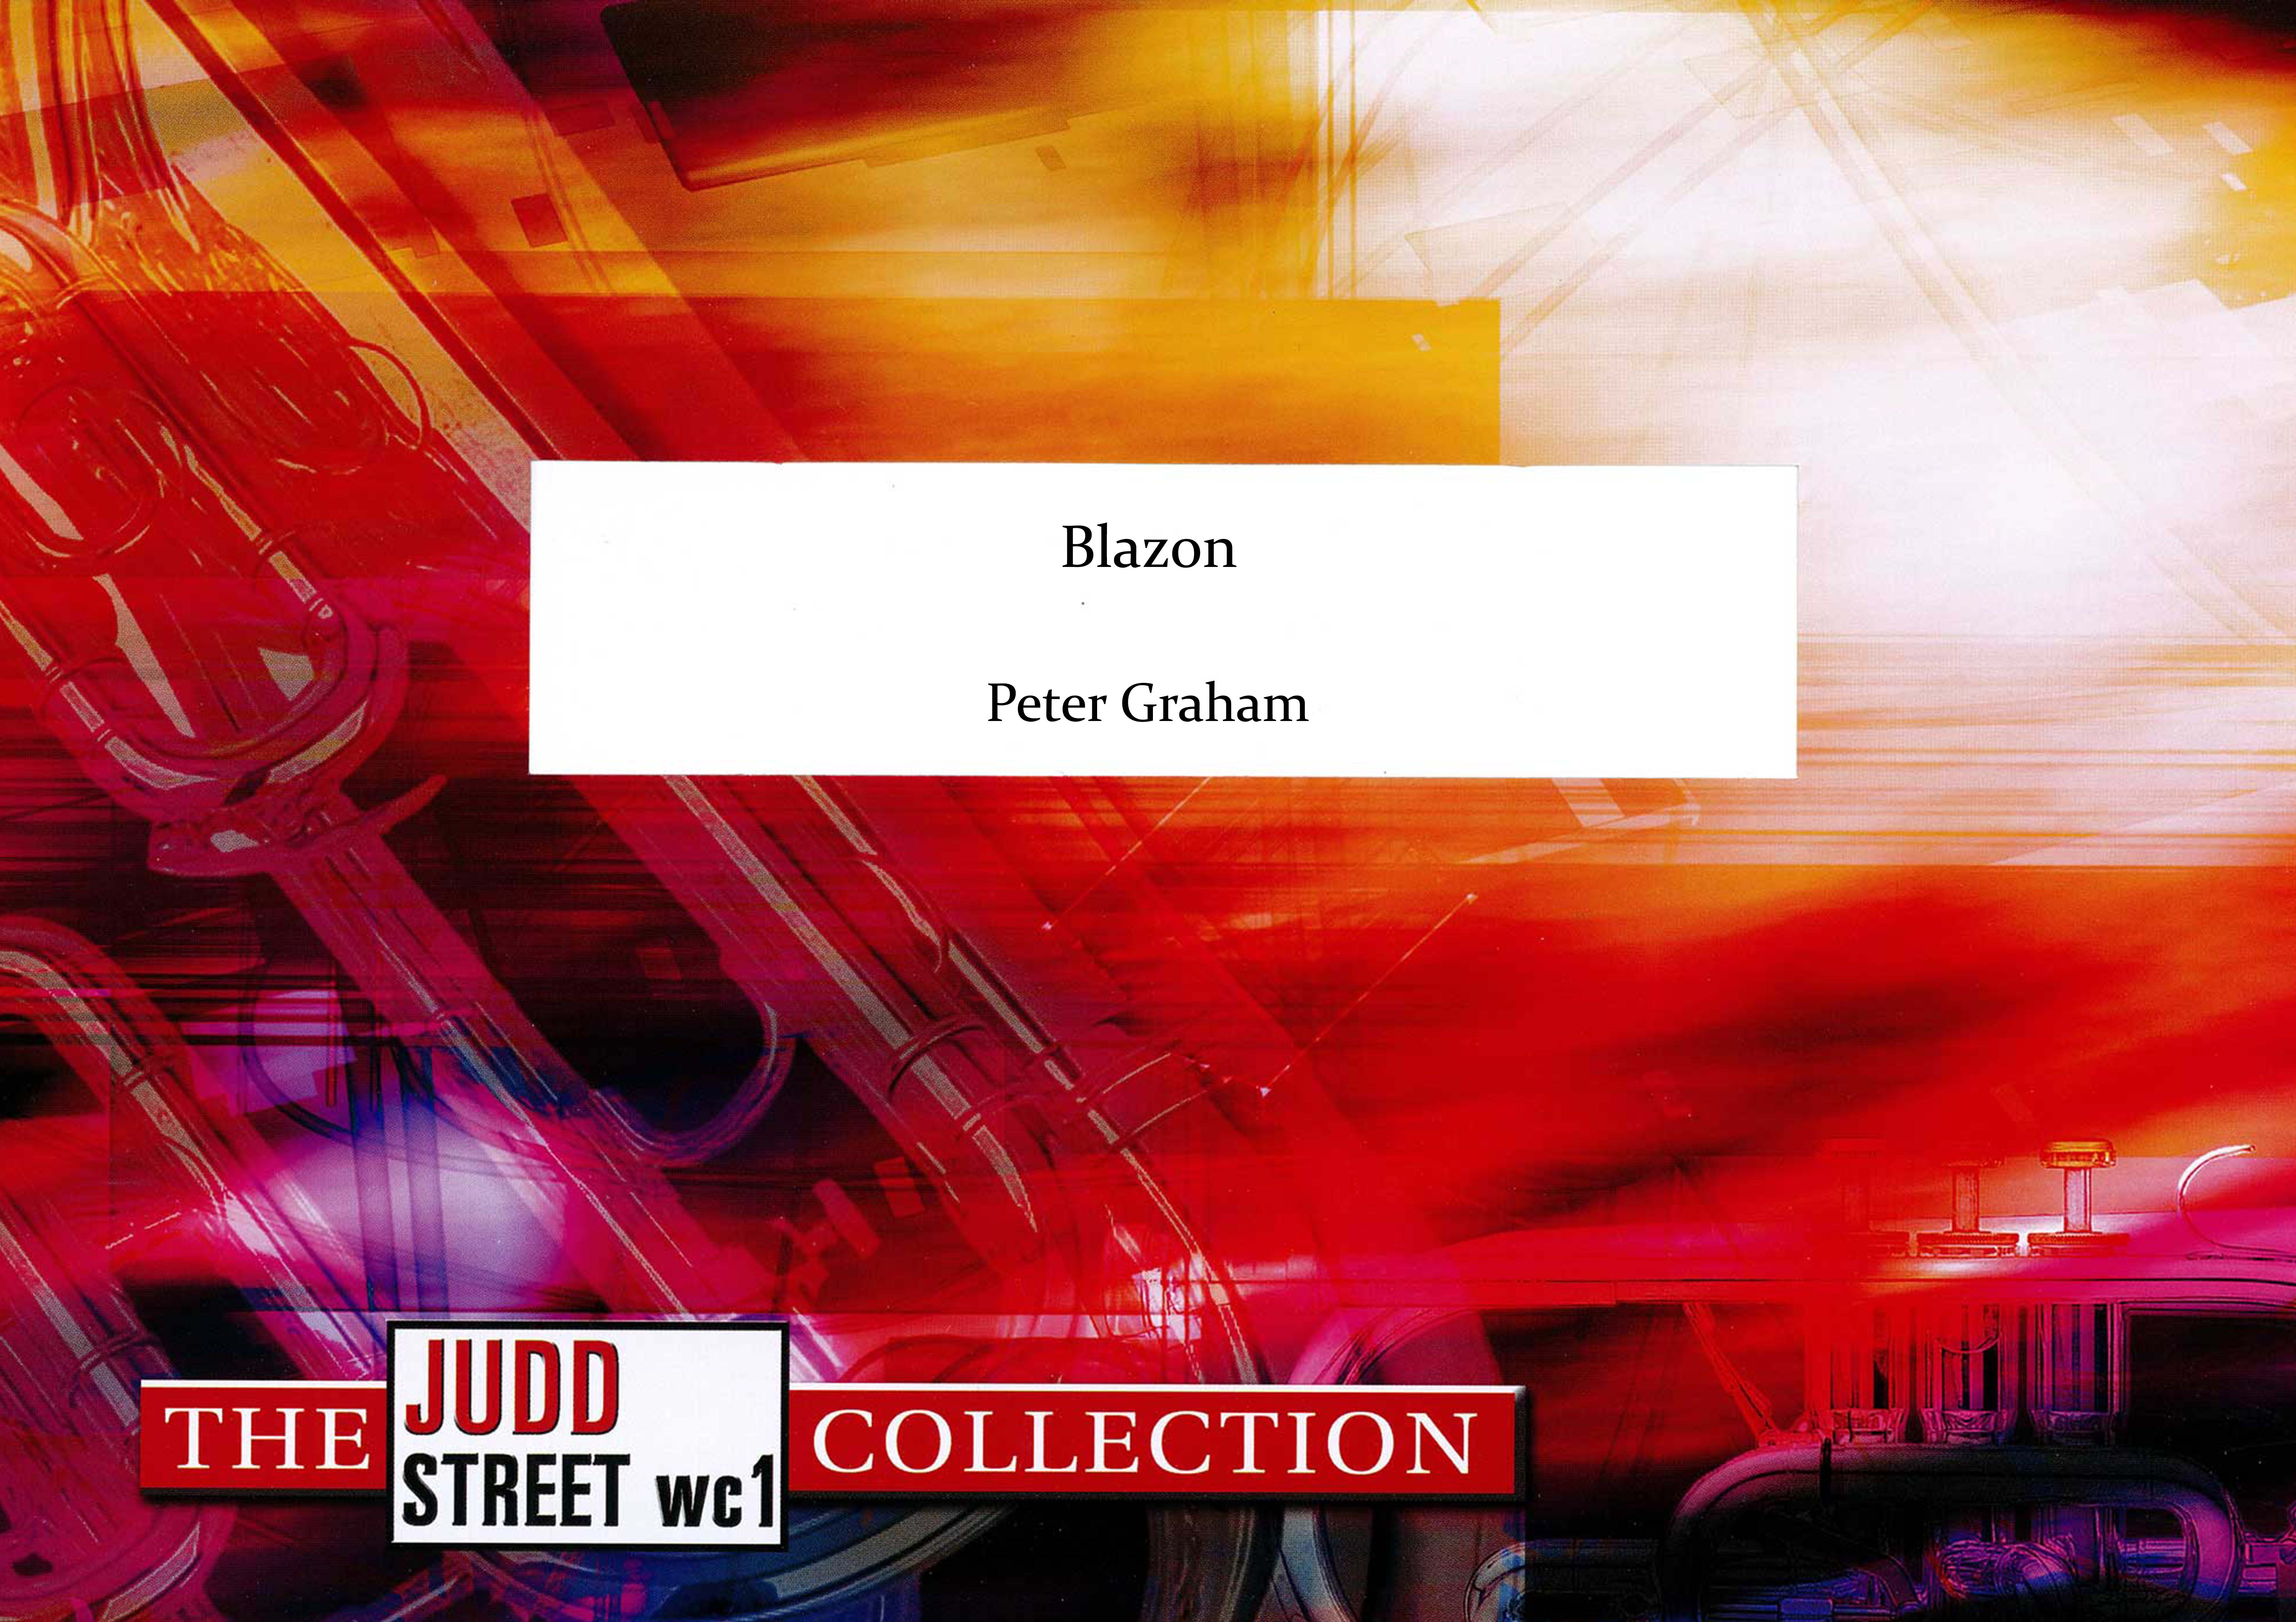 Blazon (Brass Band - Score only)